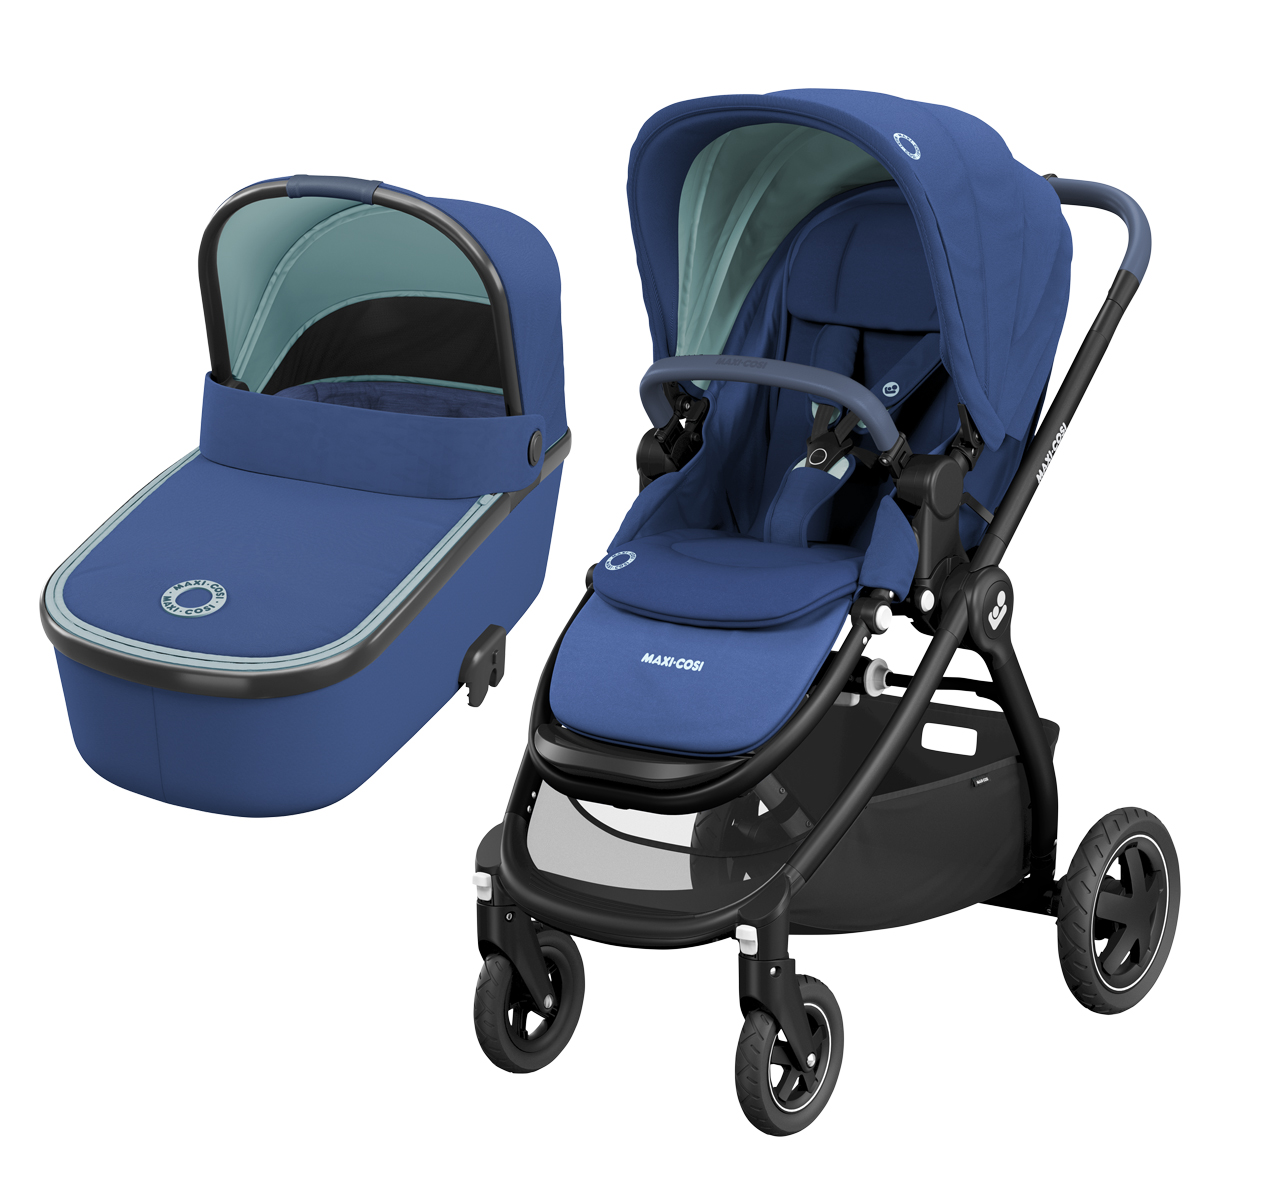 Maxicosi  ADORRA coche duo con cuco ORIA  Essential Blue con CABRIOFIX de REGALO